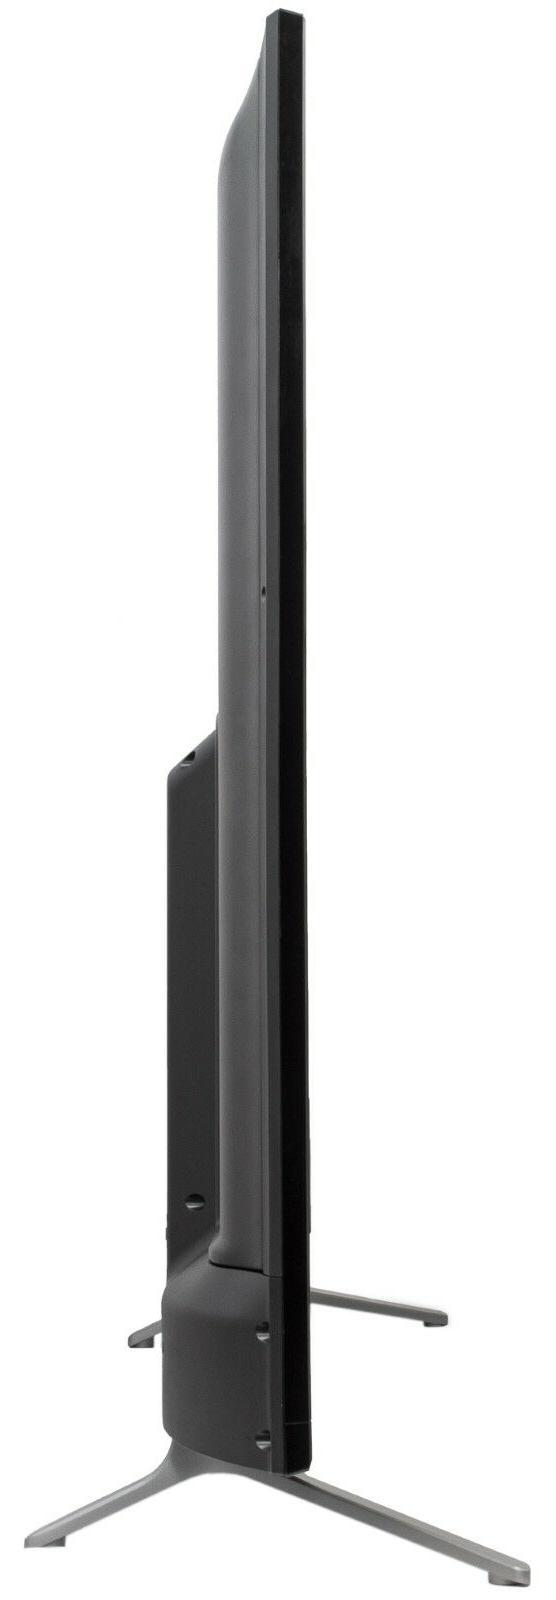 "55"" HD LED TV Flat Sceptre USB"